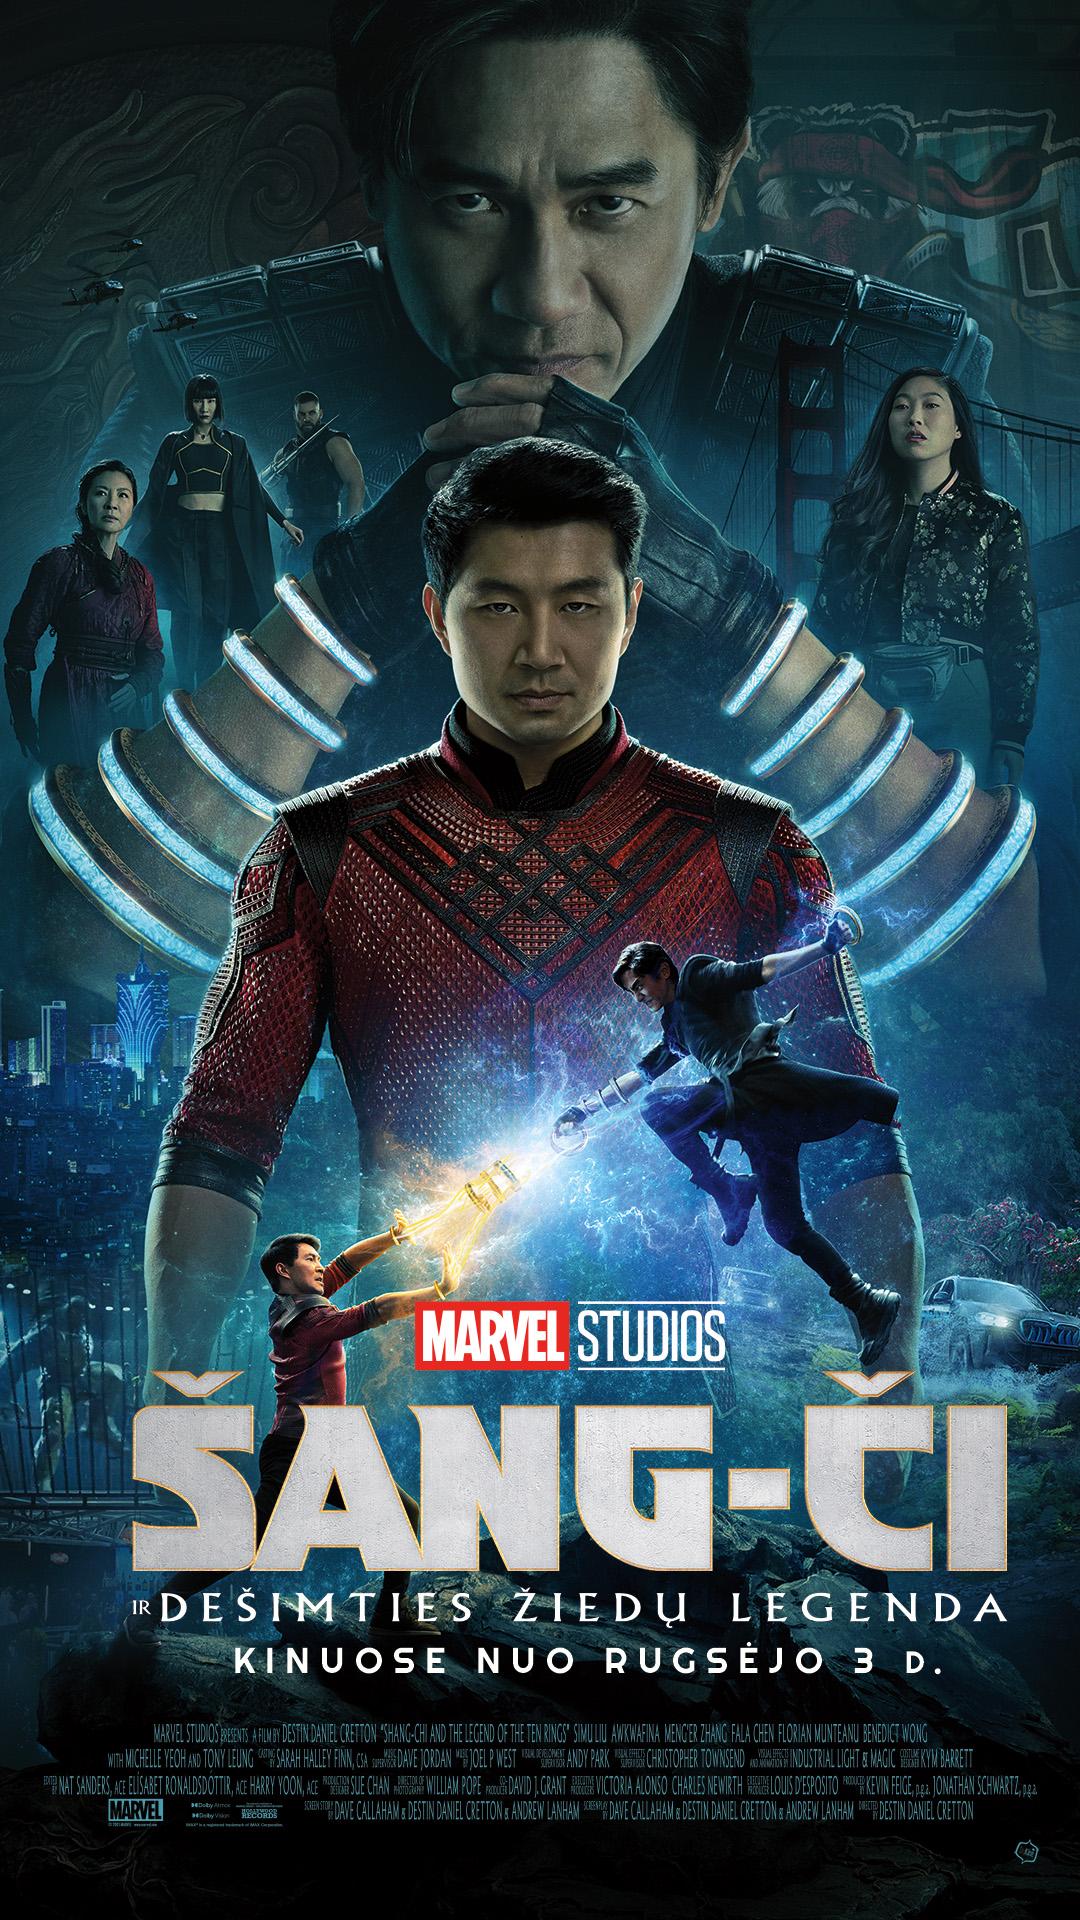 Šang-Či ir dešimties žiedų legenda (Shang-Chi and the Legend of the Ten Rings)